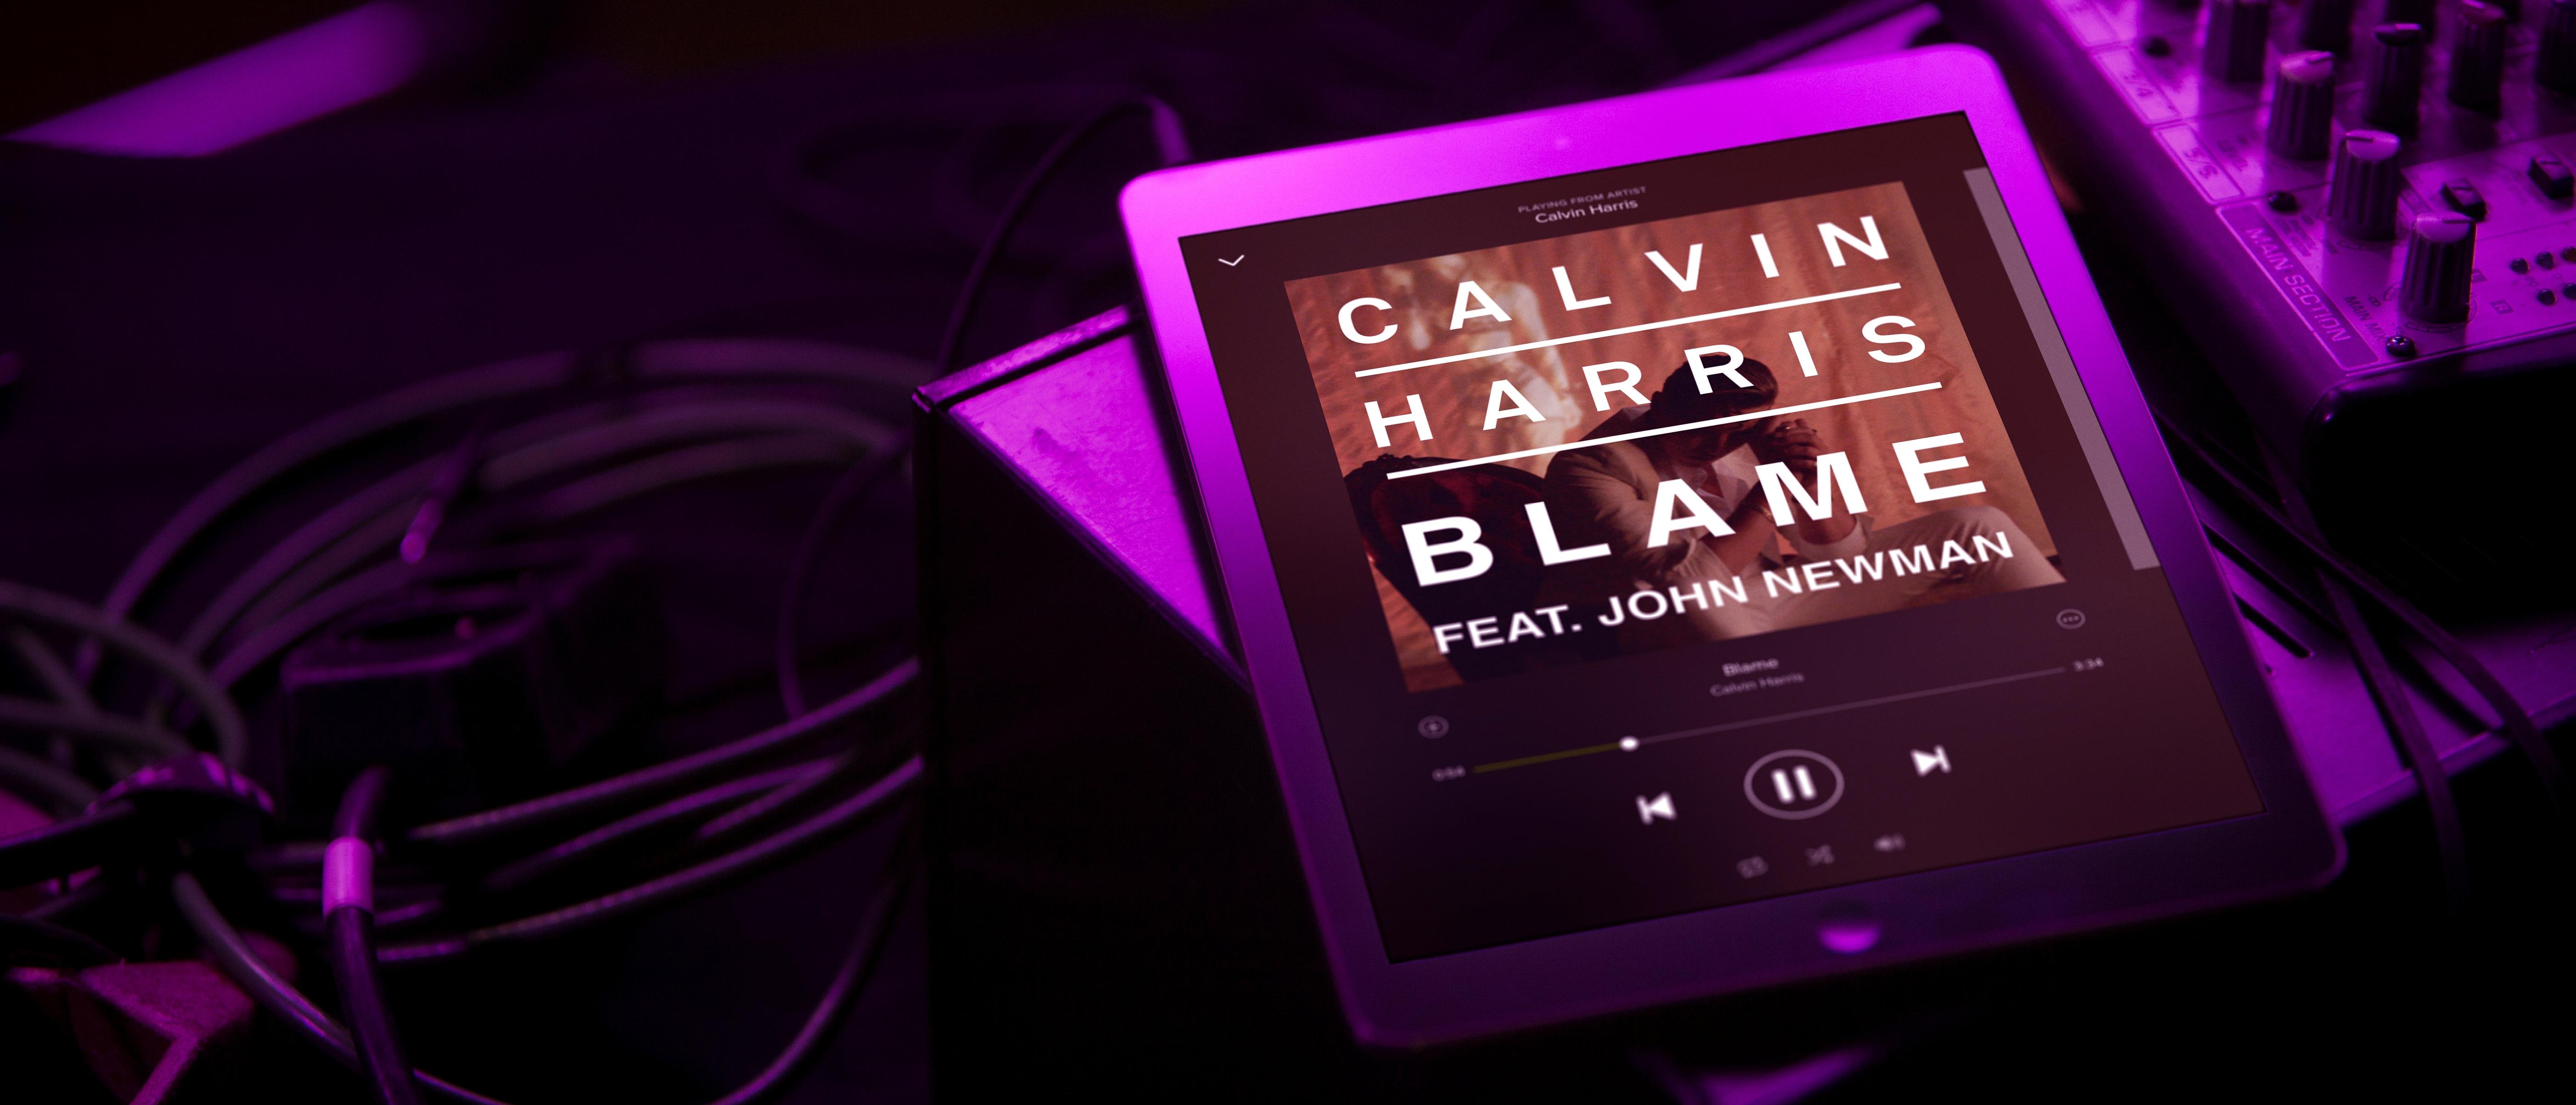 Spotify Brings its New Dark Look to iPad